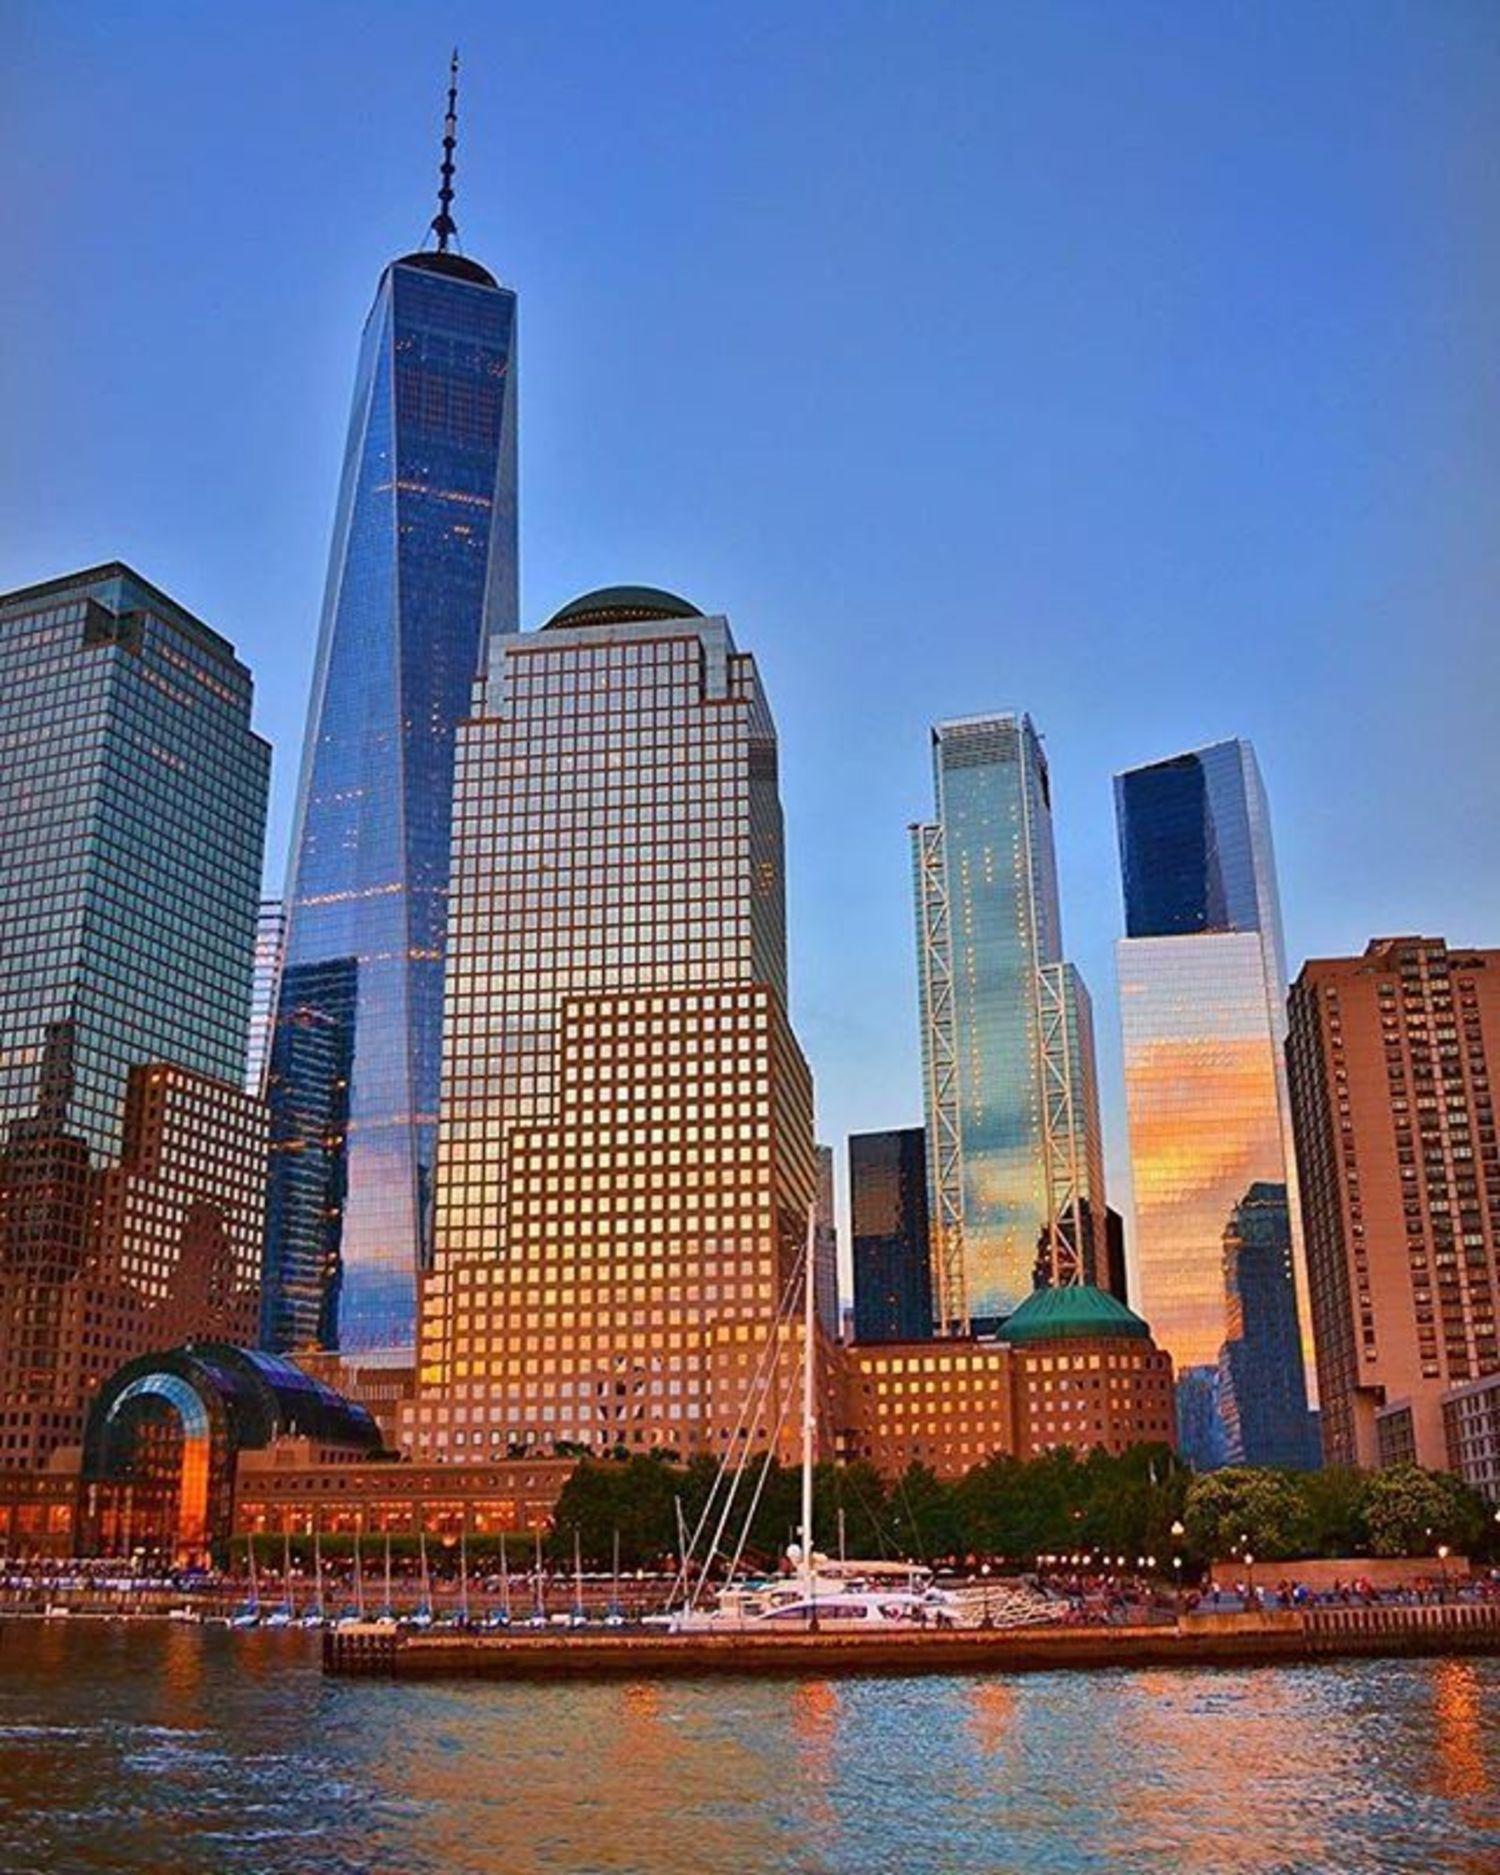 New York, New York. Photo via @gigi.nyc #viewingnyc #newyorkcity #newyork